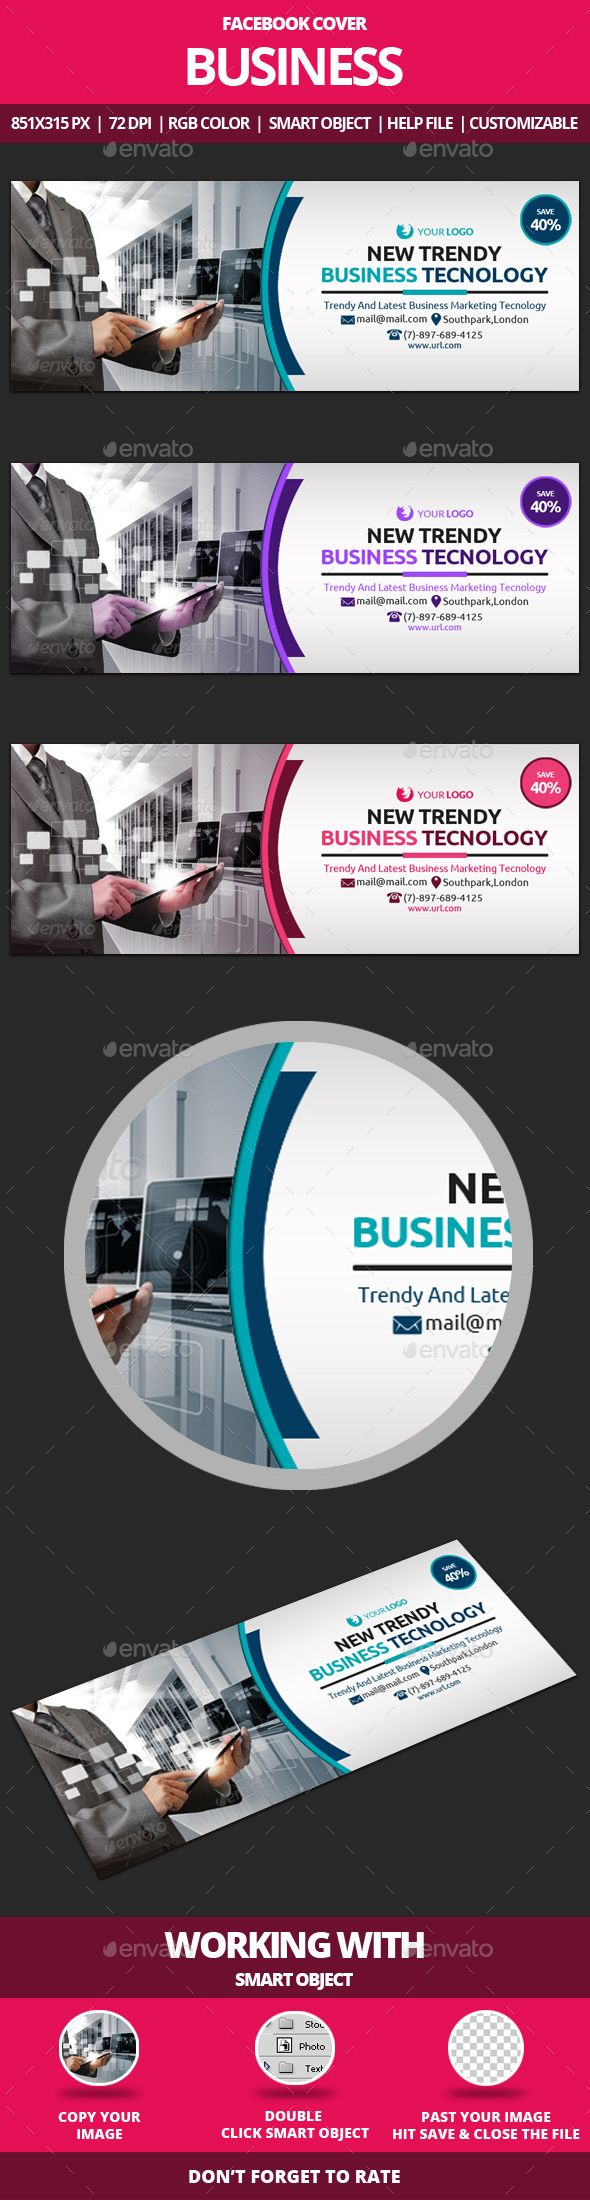 Business Facebook Cover Template PSD #design Download: http://graphicriver.net/item/business-facebook-cover/13918004?ref=ksioks